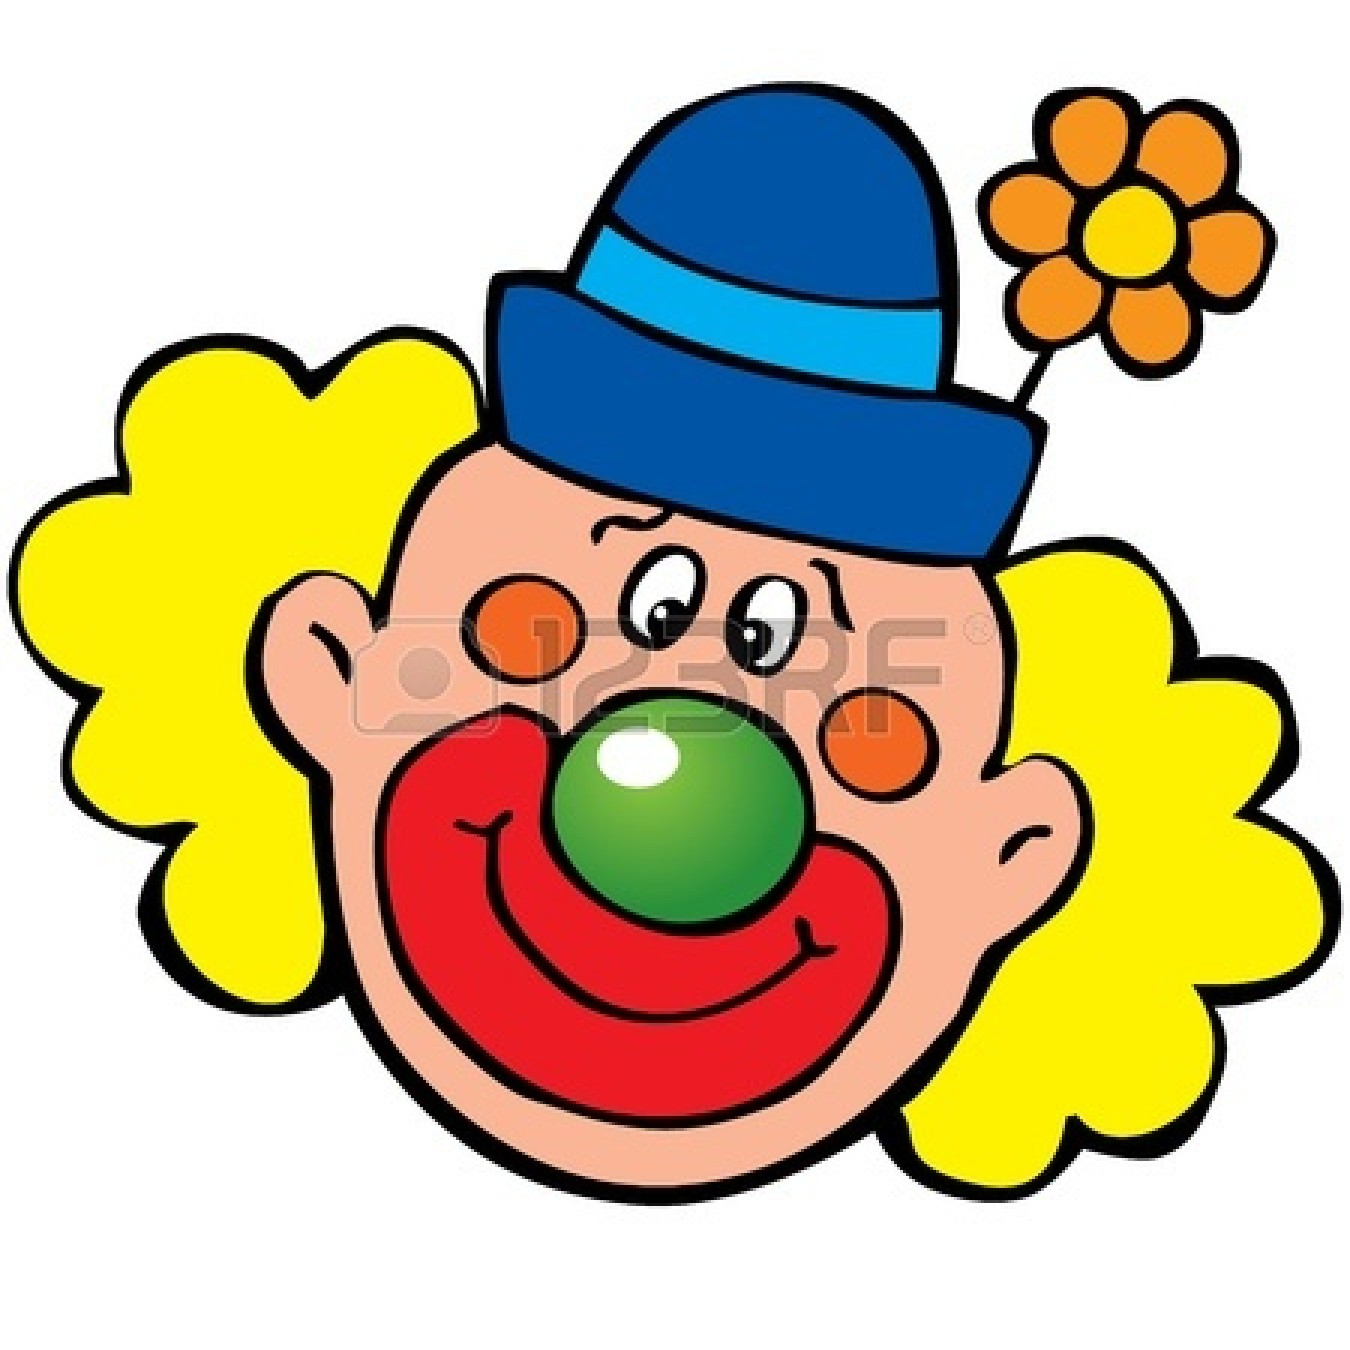 1350x1350 Clown Face Clip Art Clown Clip Art 15067566 Happy Clown Art